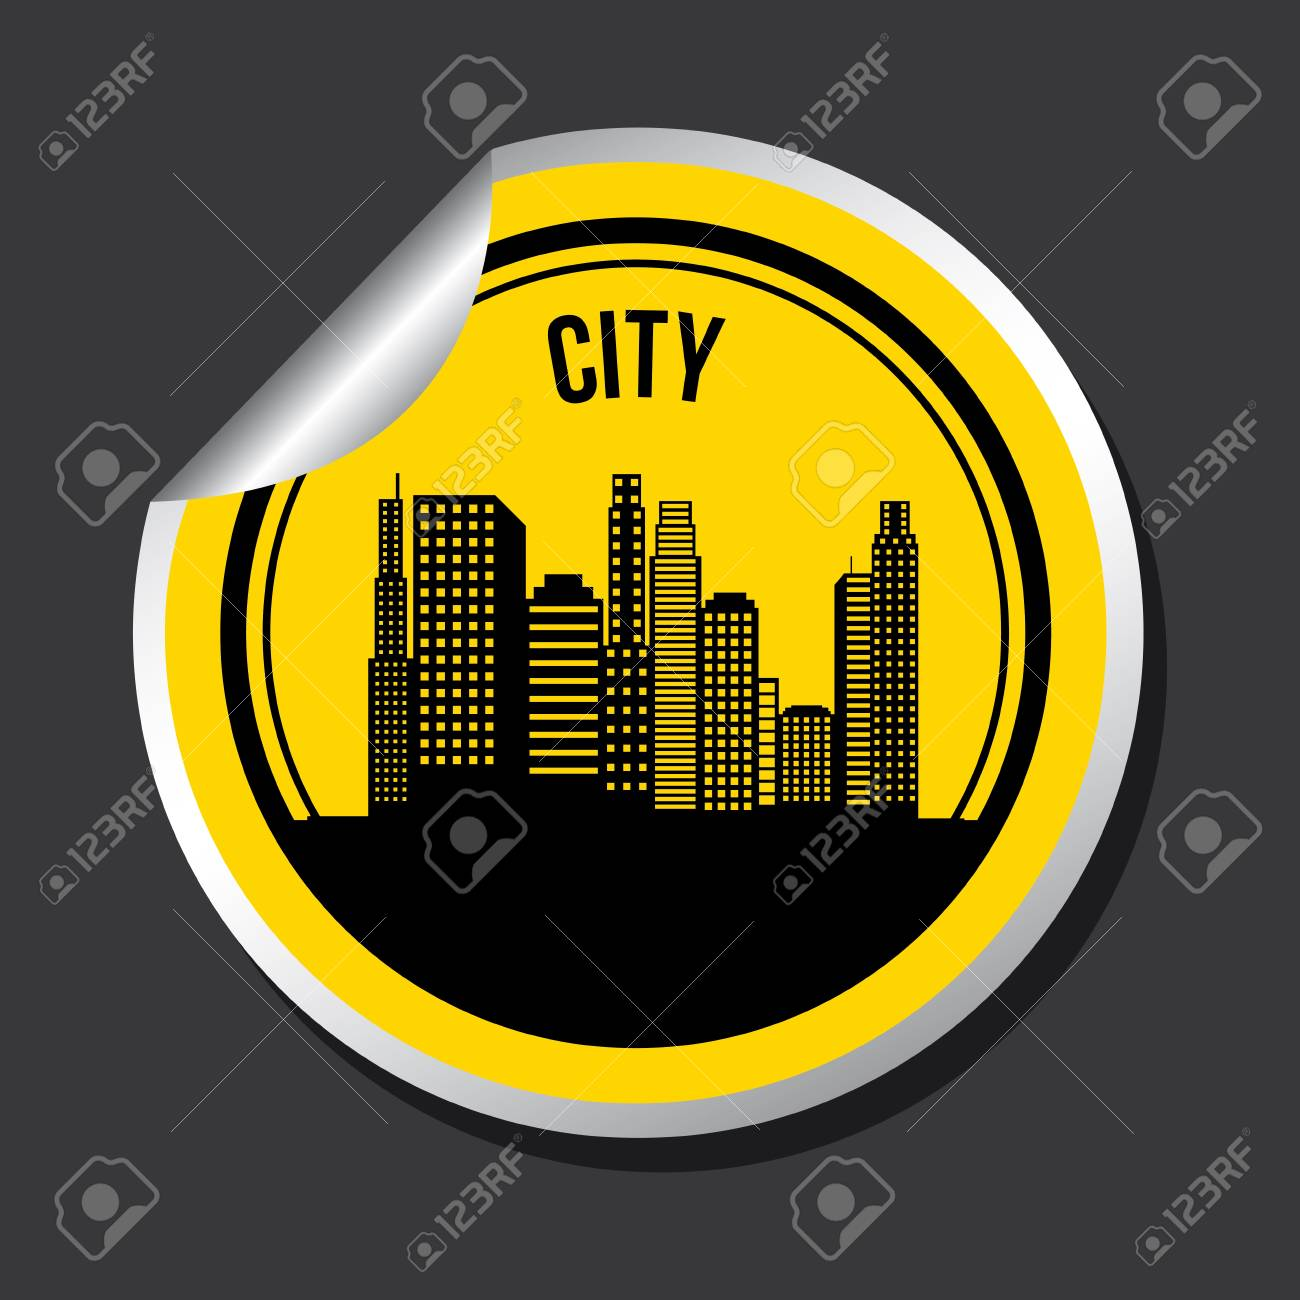 city design over black background vector illustration Stock Vector - 20107897